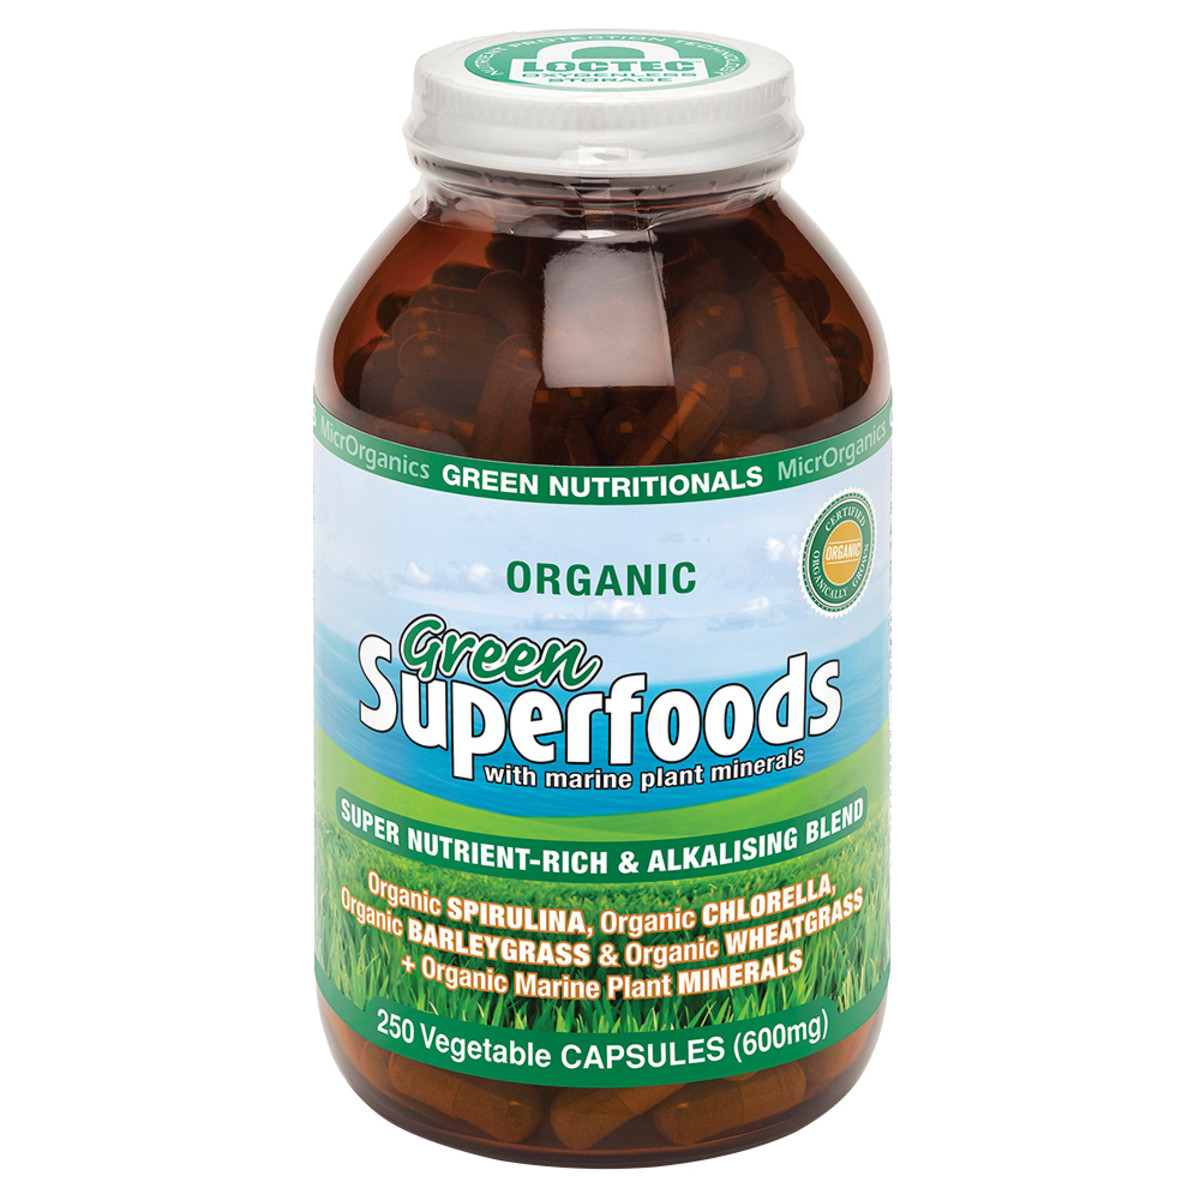 MICRORGANICS GREEN NUTRITIONALS SUPERFOODS 600MG 250C